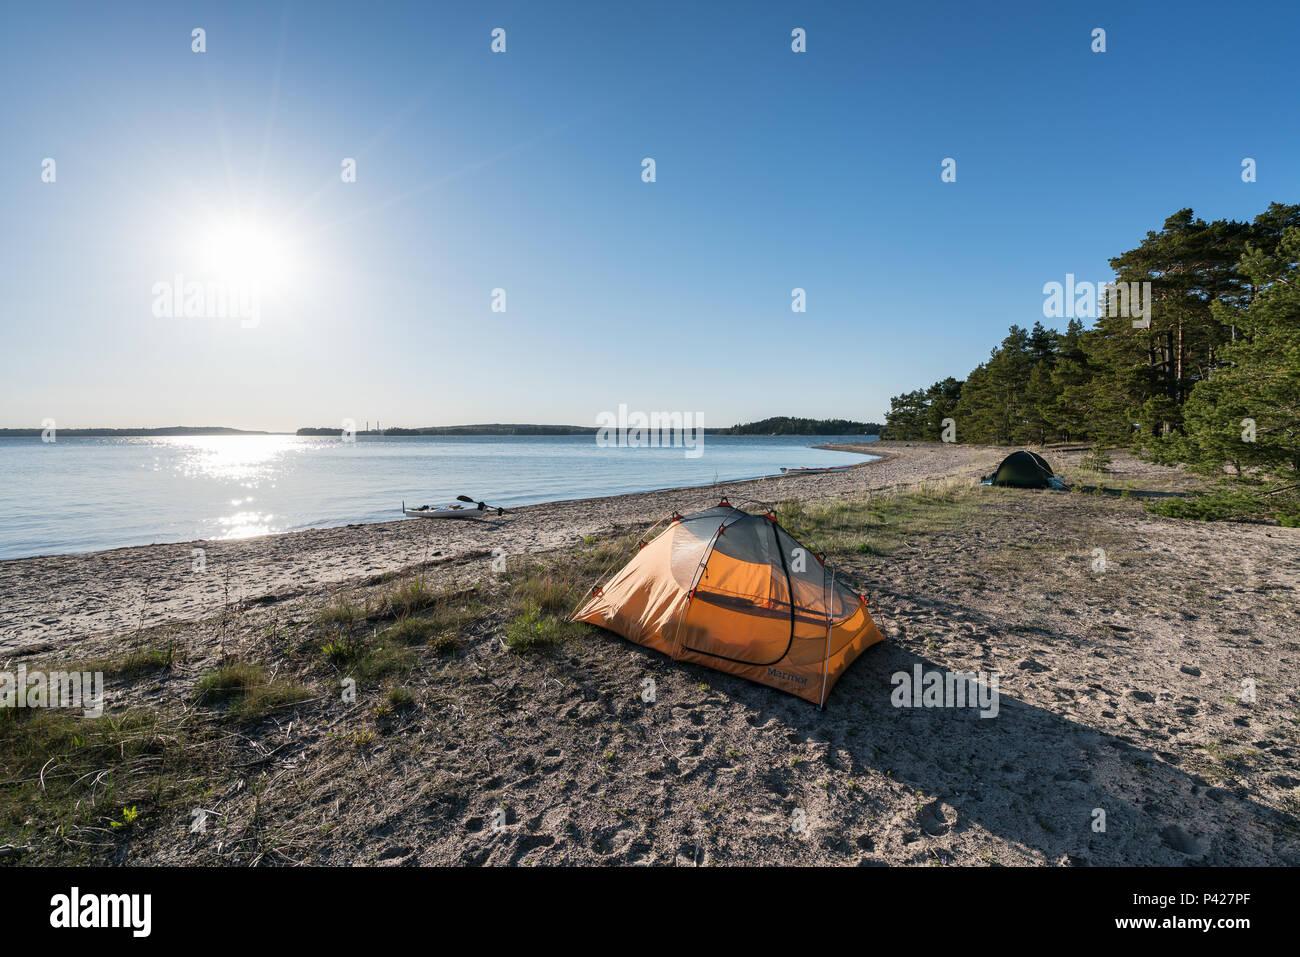 Camping at Stora Fagerö island, Inkoo, Finland, Europe, EU - Stock Image